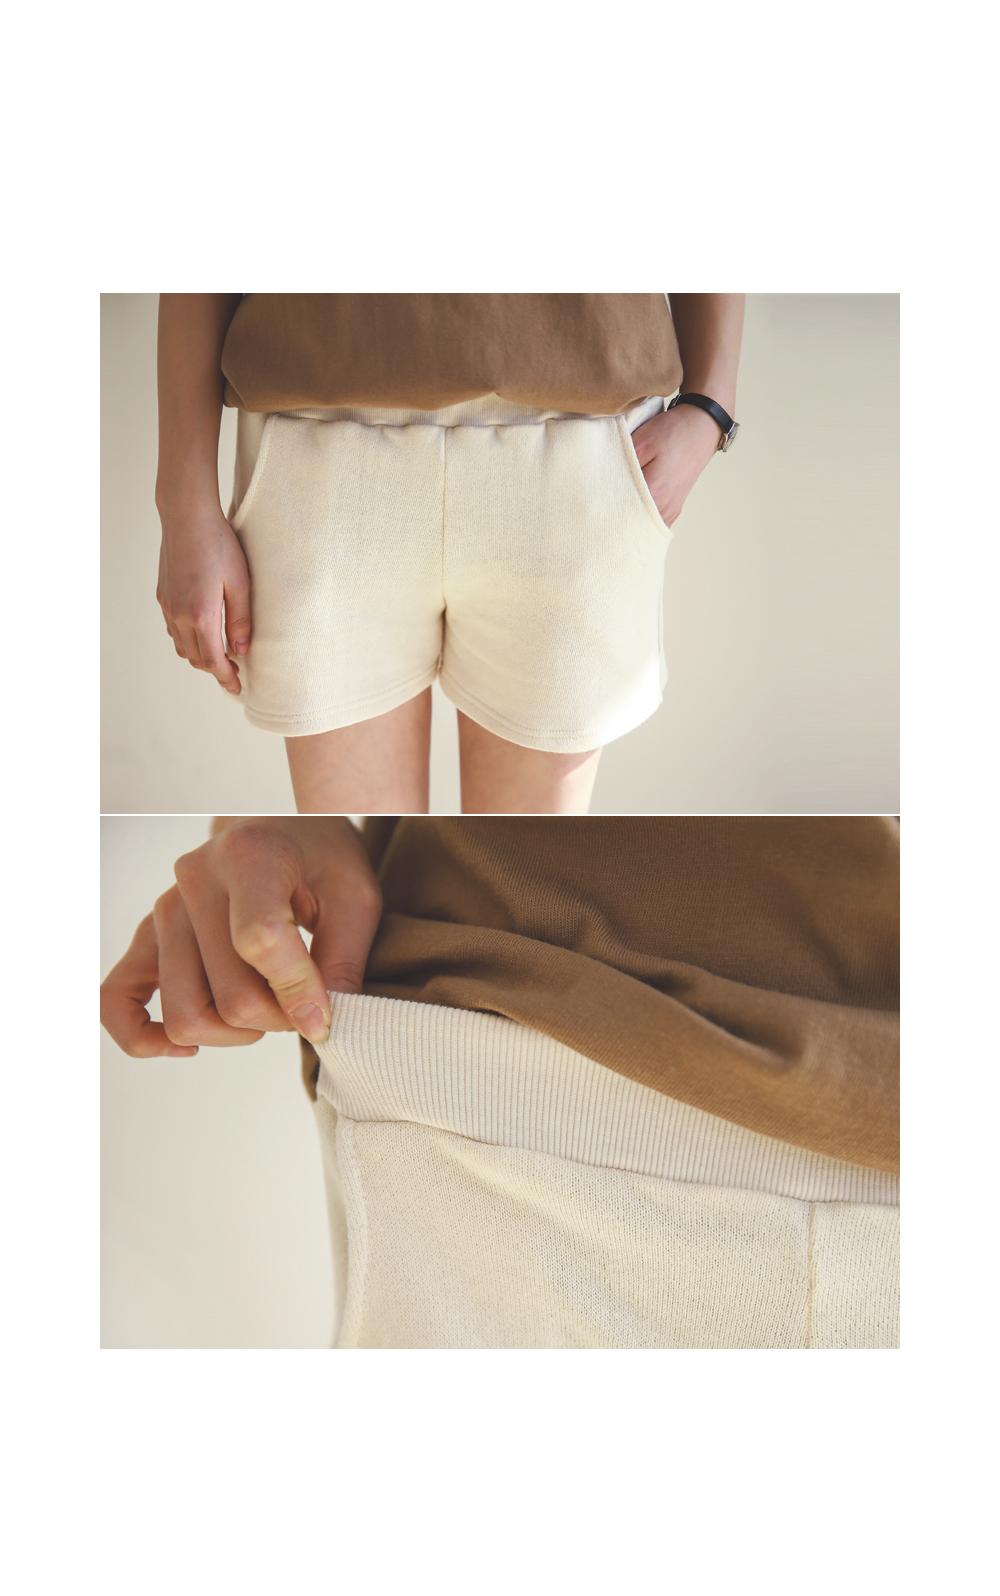 [BOTTOM] DAILY TRAINING PANTS